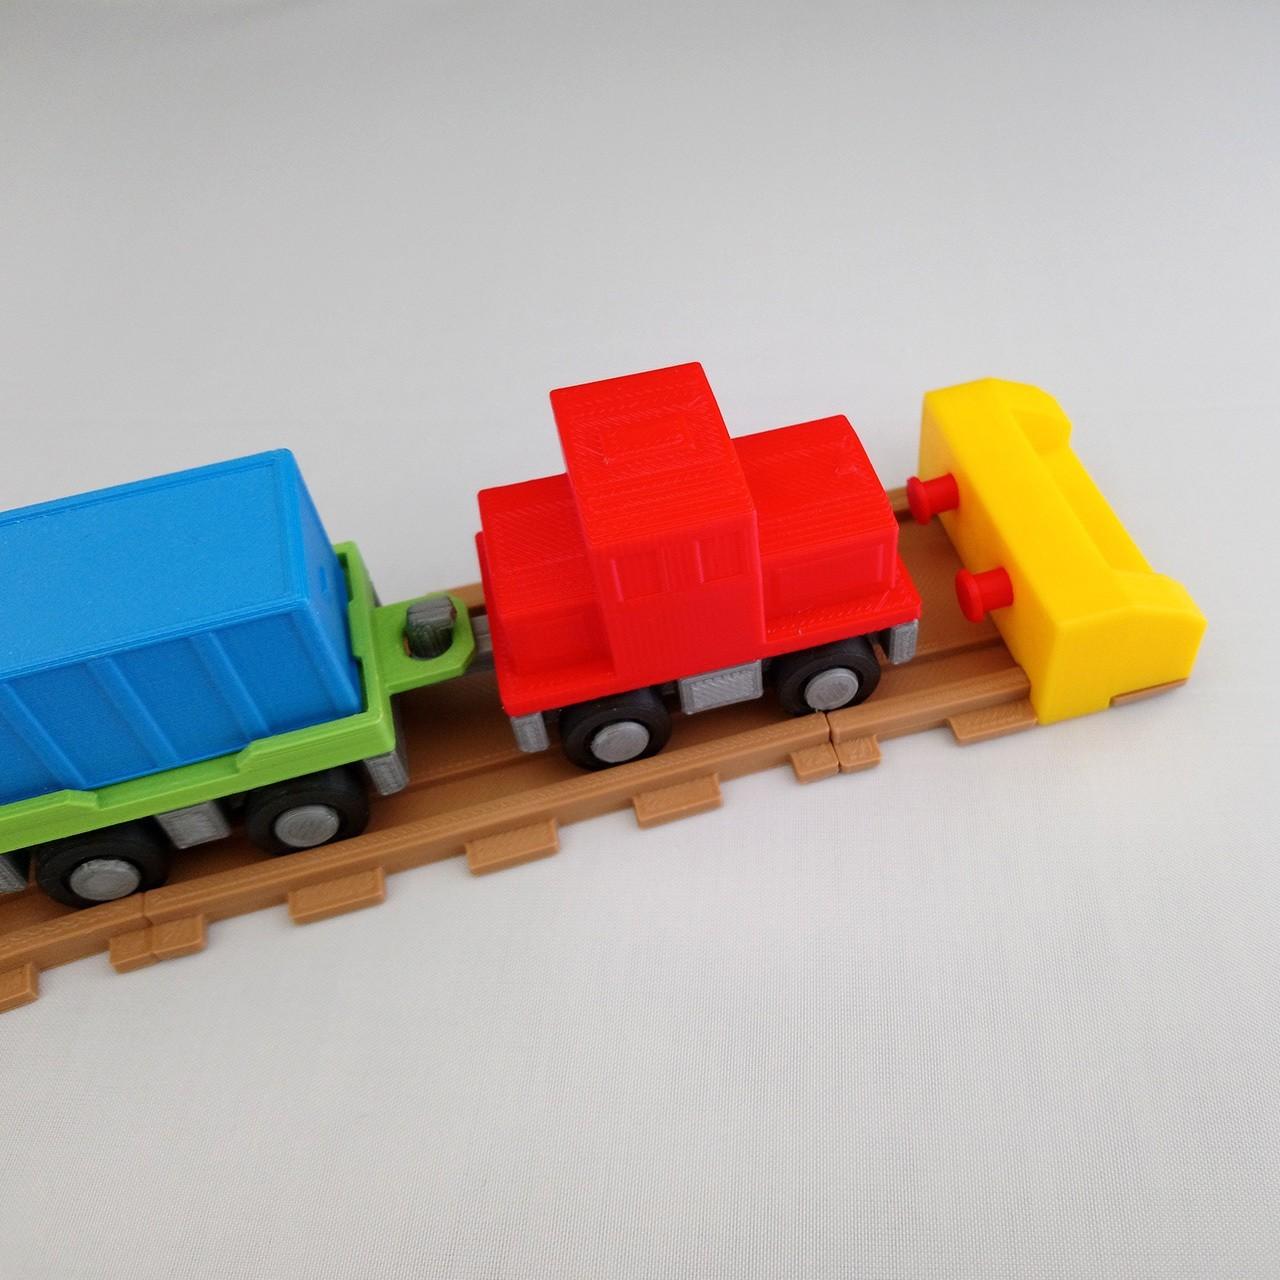 smalltoys-trainEndBumper03.jpg Download STL file SmallToys - Railways - Bumper stop • 3D printable model, Wabby